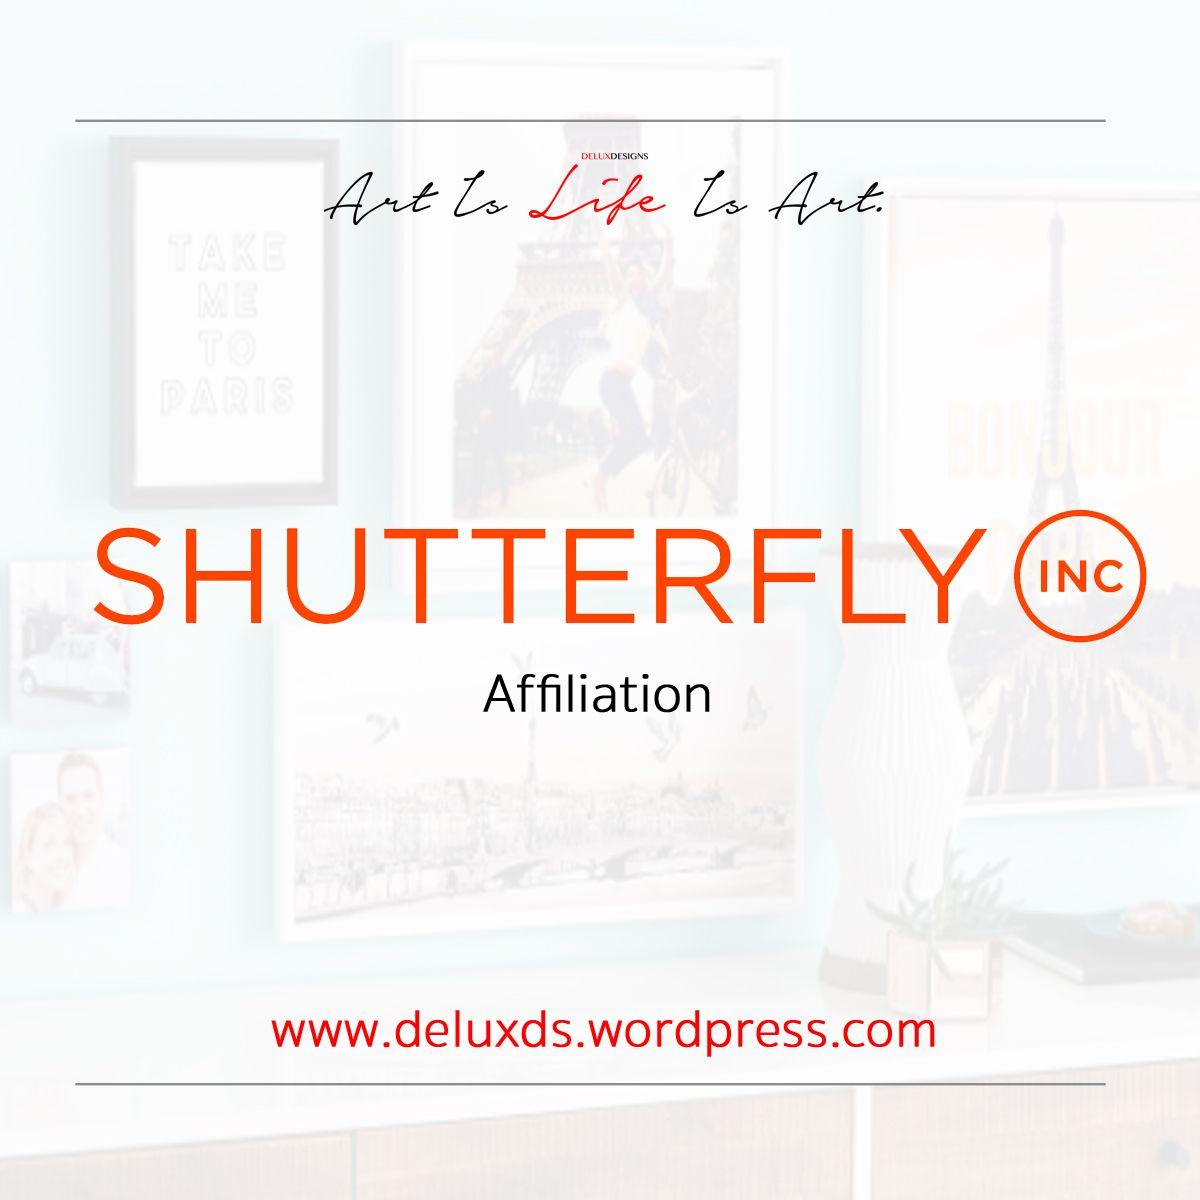 shutterfly customer support